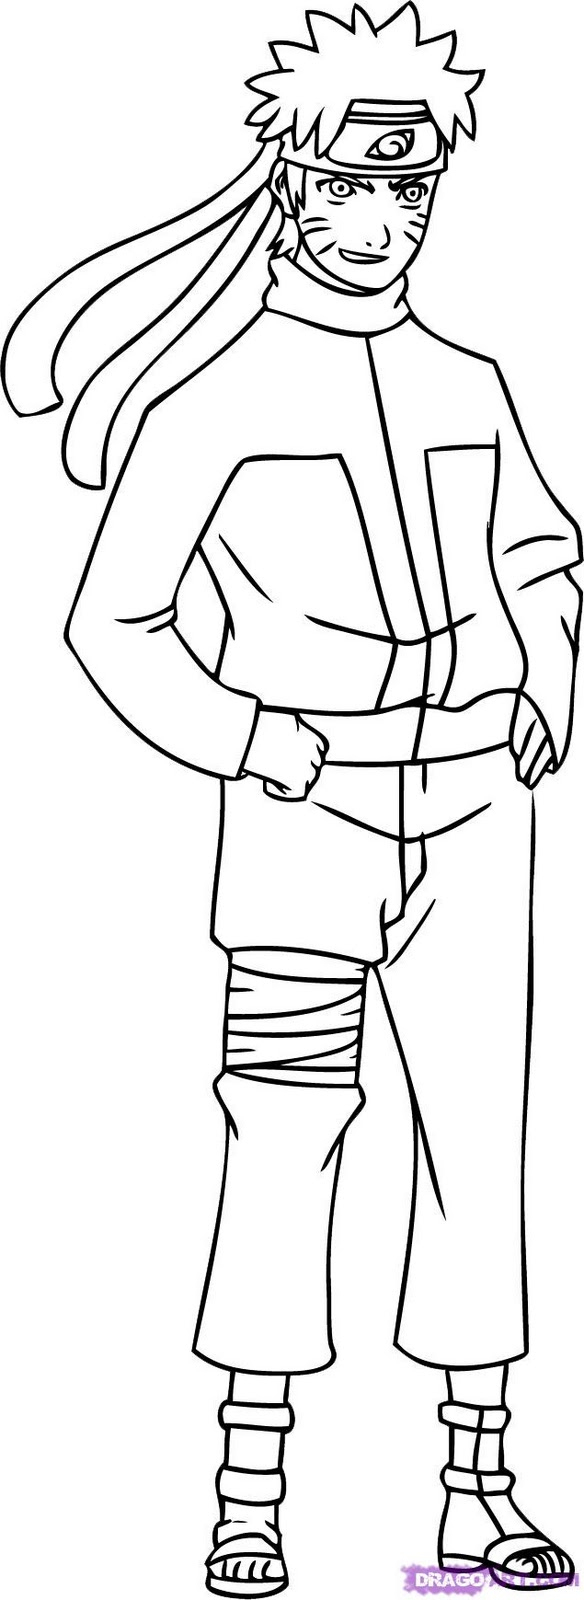 Naruto #49 (Dessins Animés) – Coloriages À Imprimer dedans Coloriage De Naruto Shippuden A Imprimer